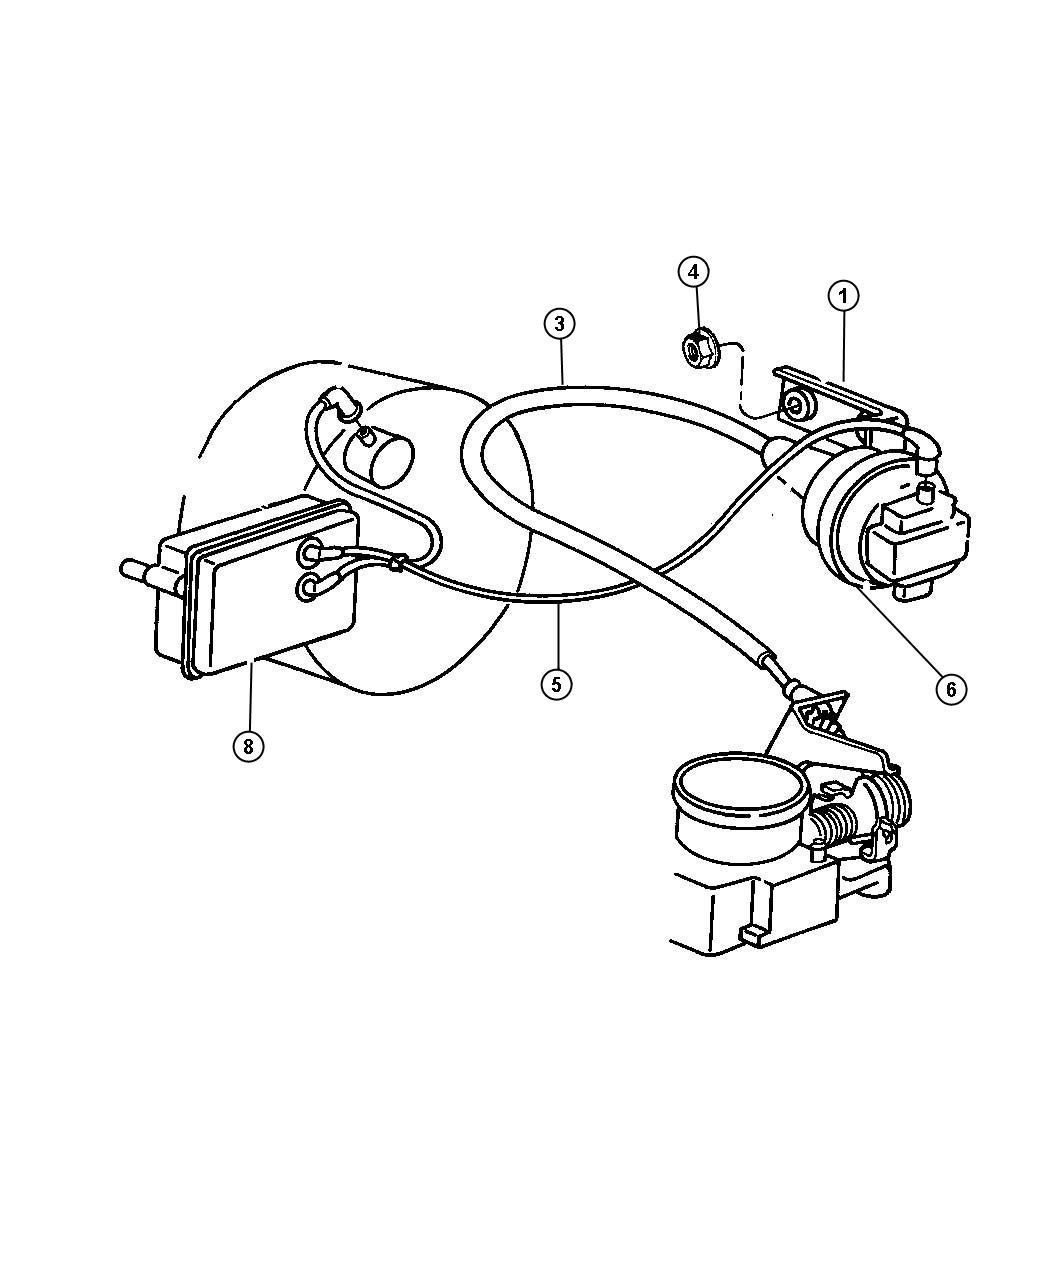 mack truck door parts diagram  diagram  auto wiring diagram